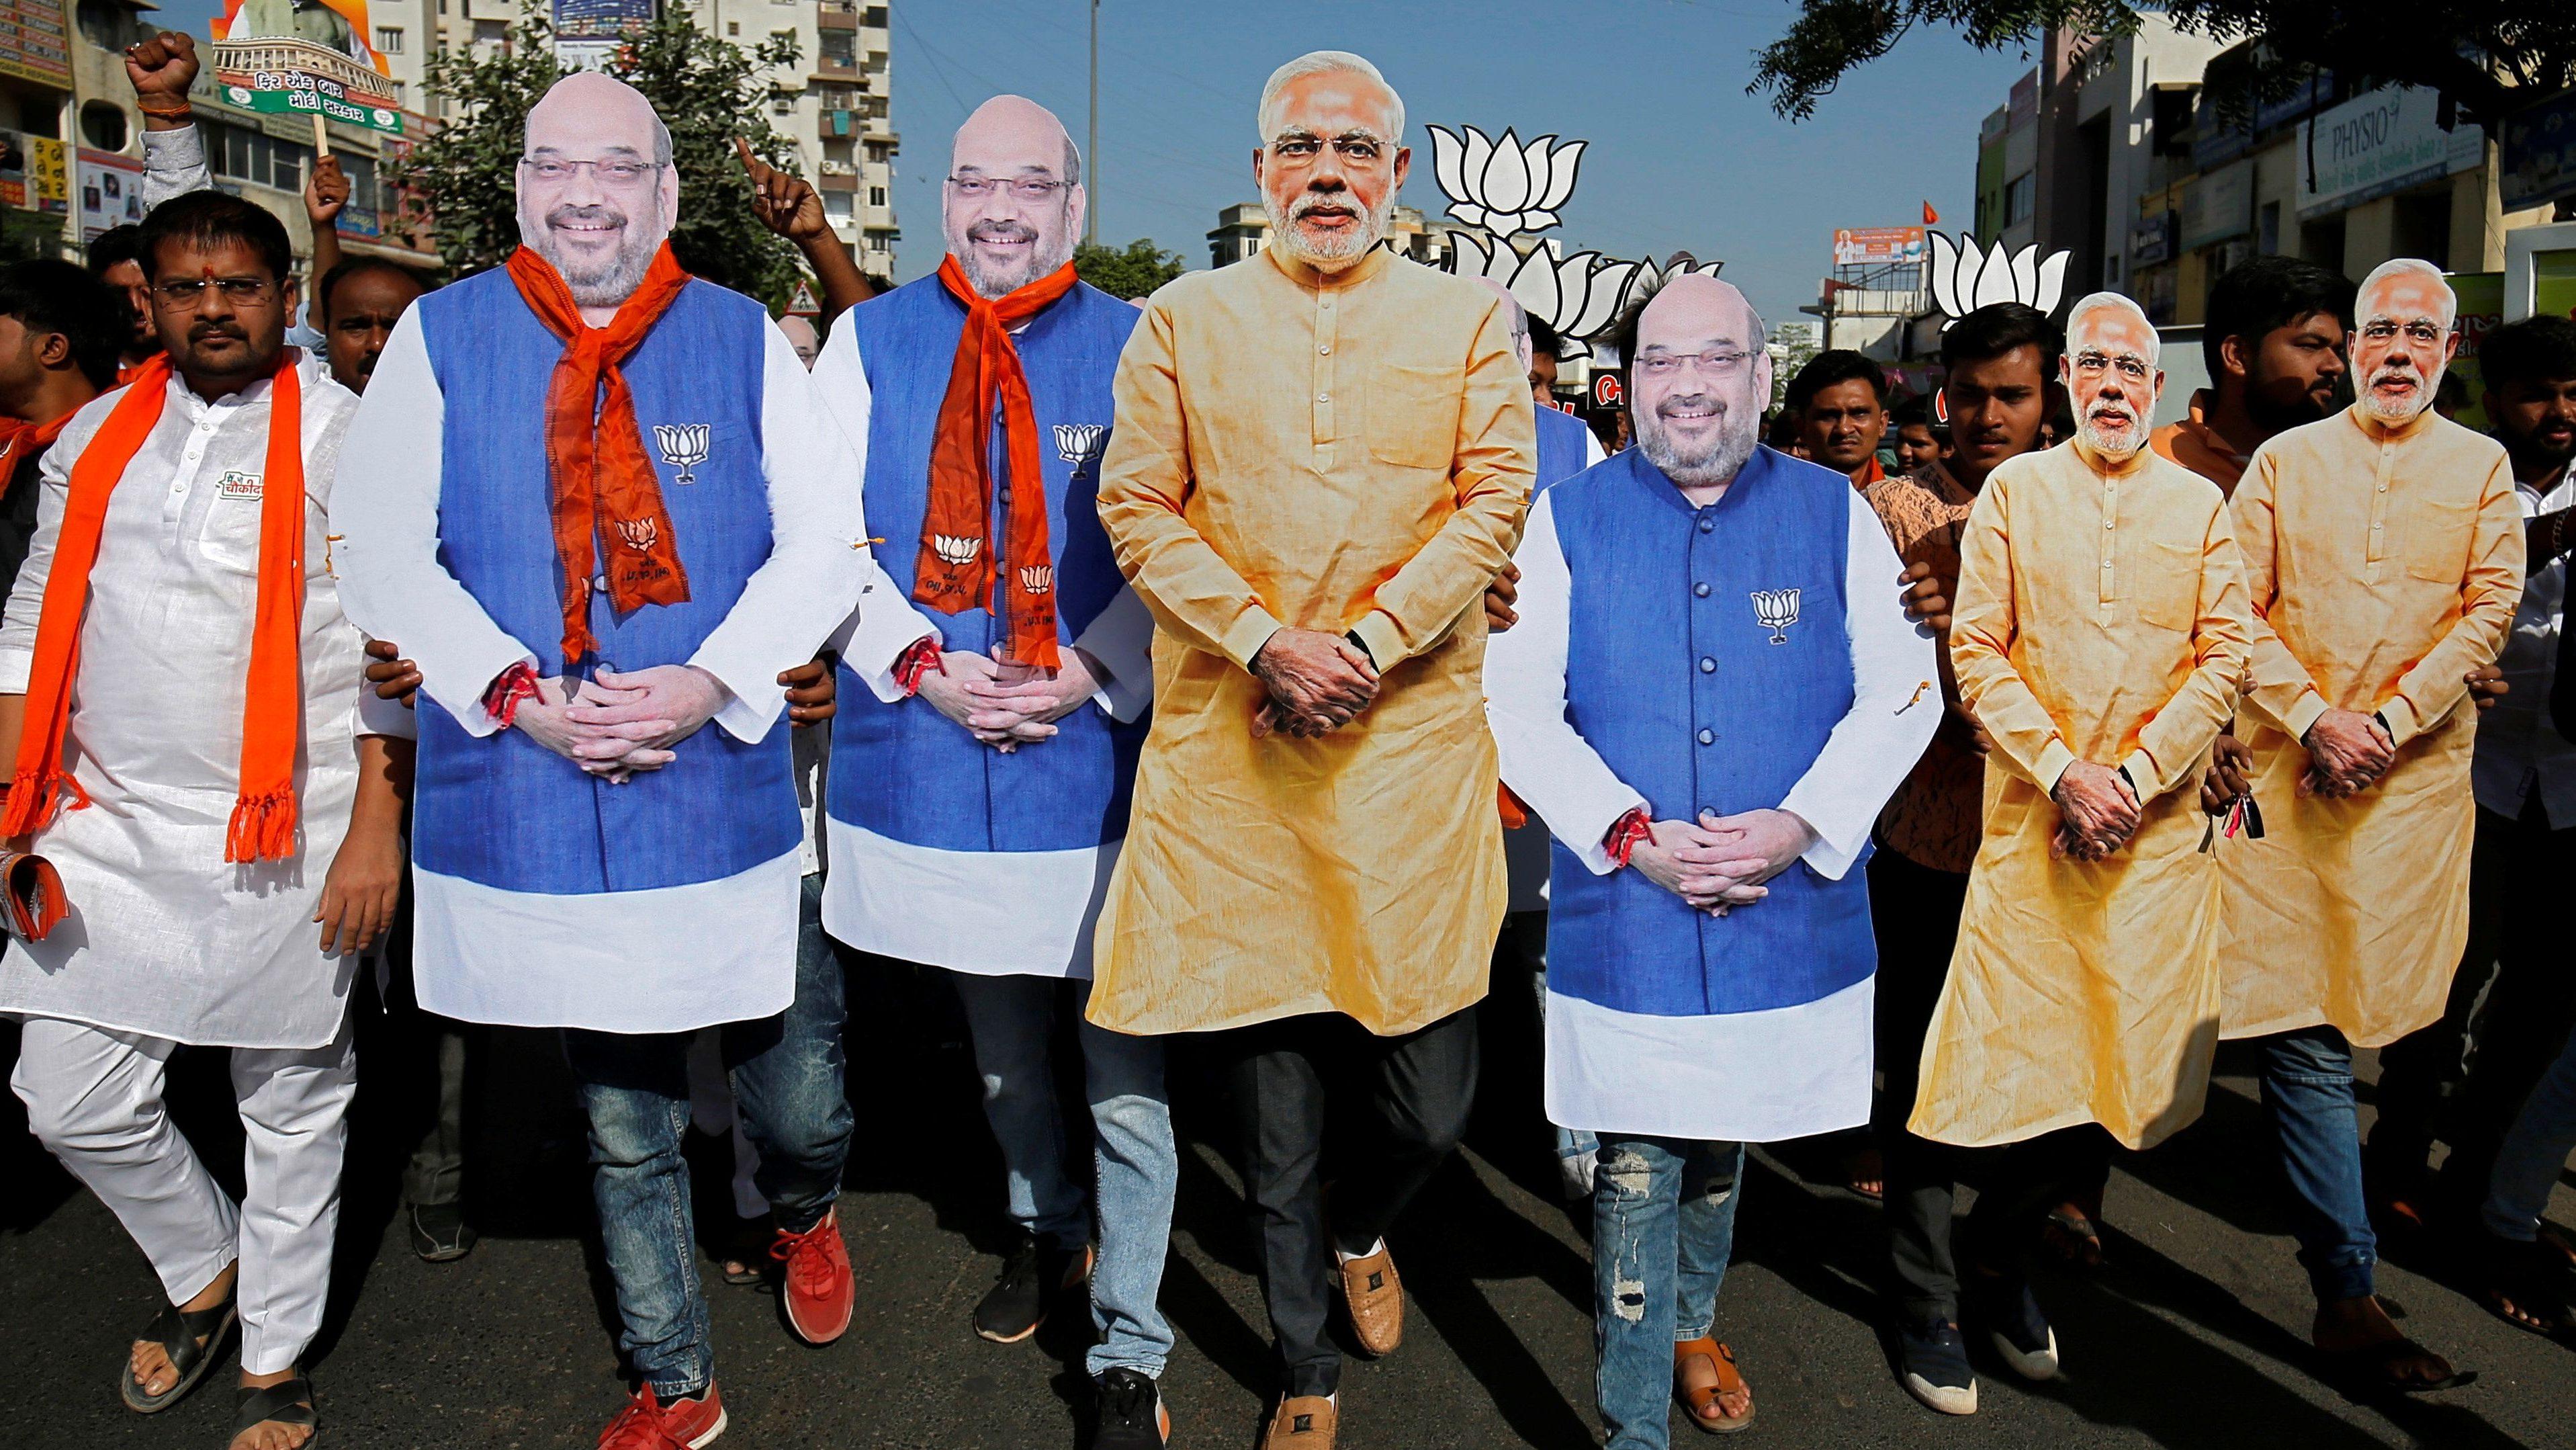 BJP threat to restrict Indian citizenship targets Muslims — Quartz India